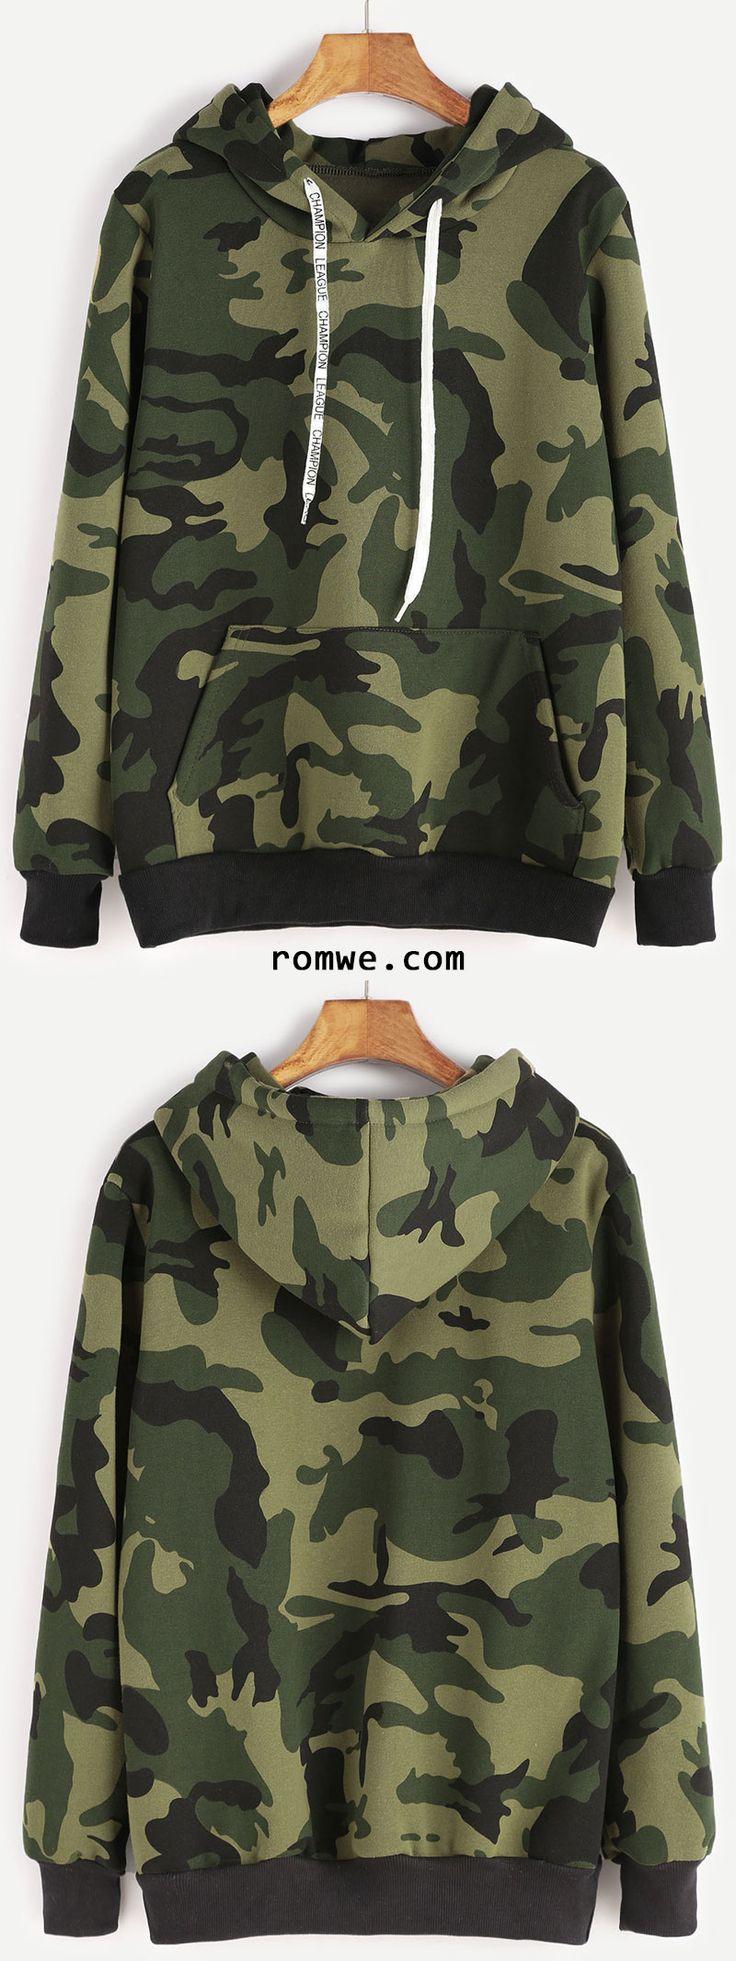 Camo Print Contrast Trim Drawstring Hooded Pocket Sweatshirt